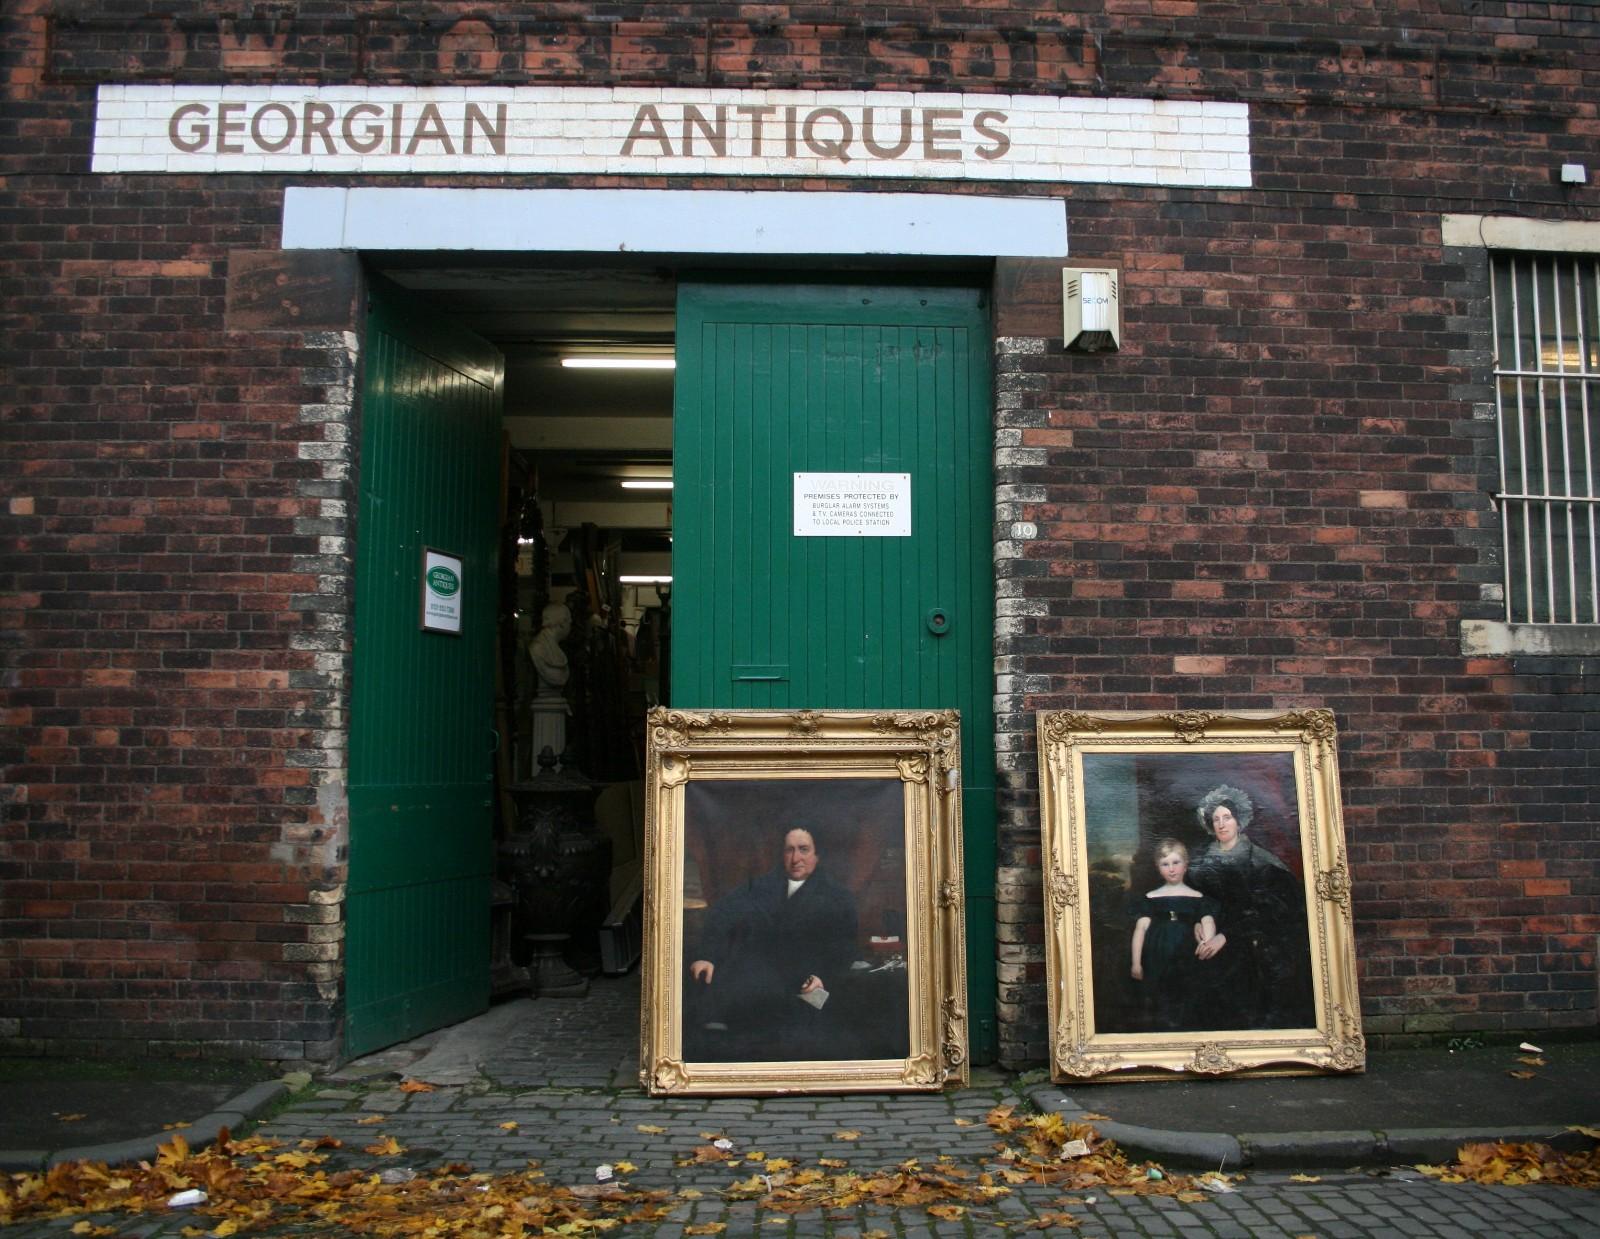 Georgian Antiques image (1 of 6)